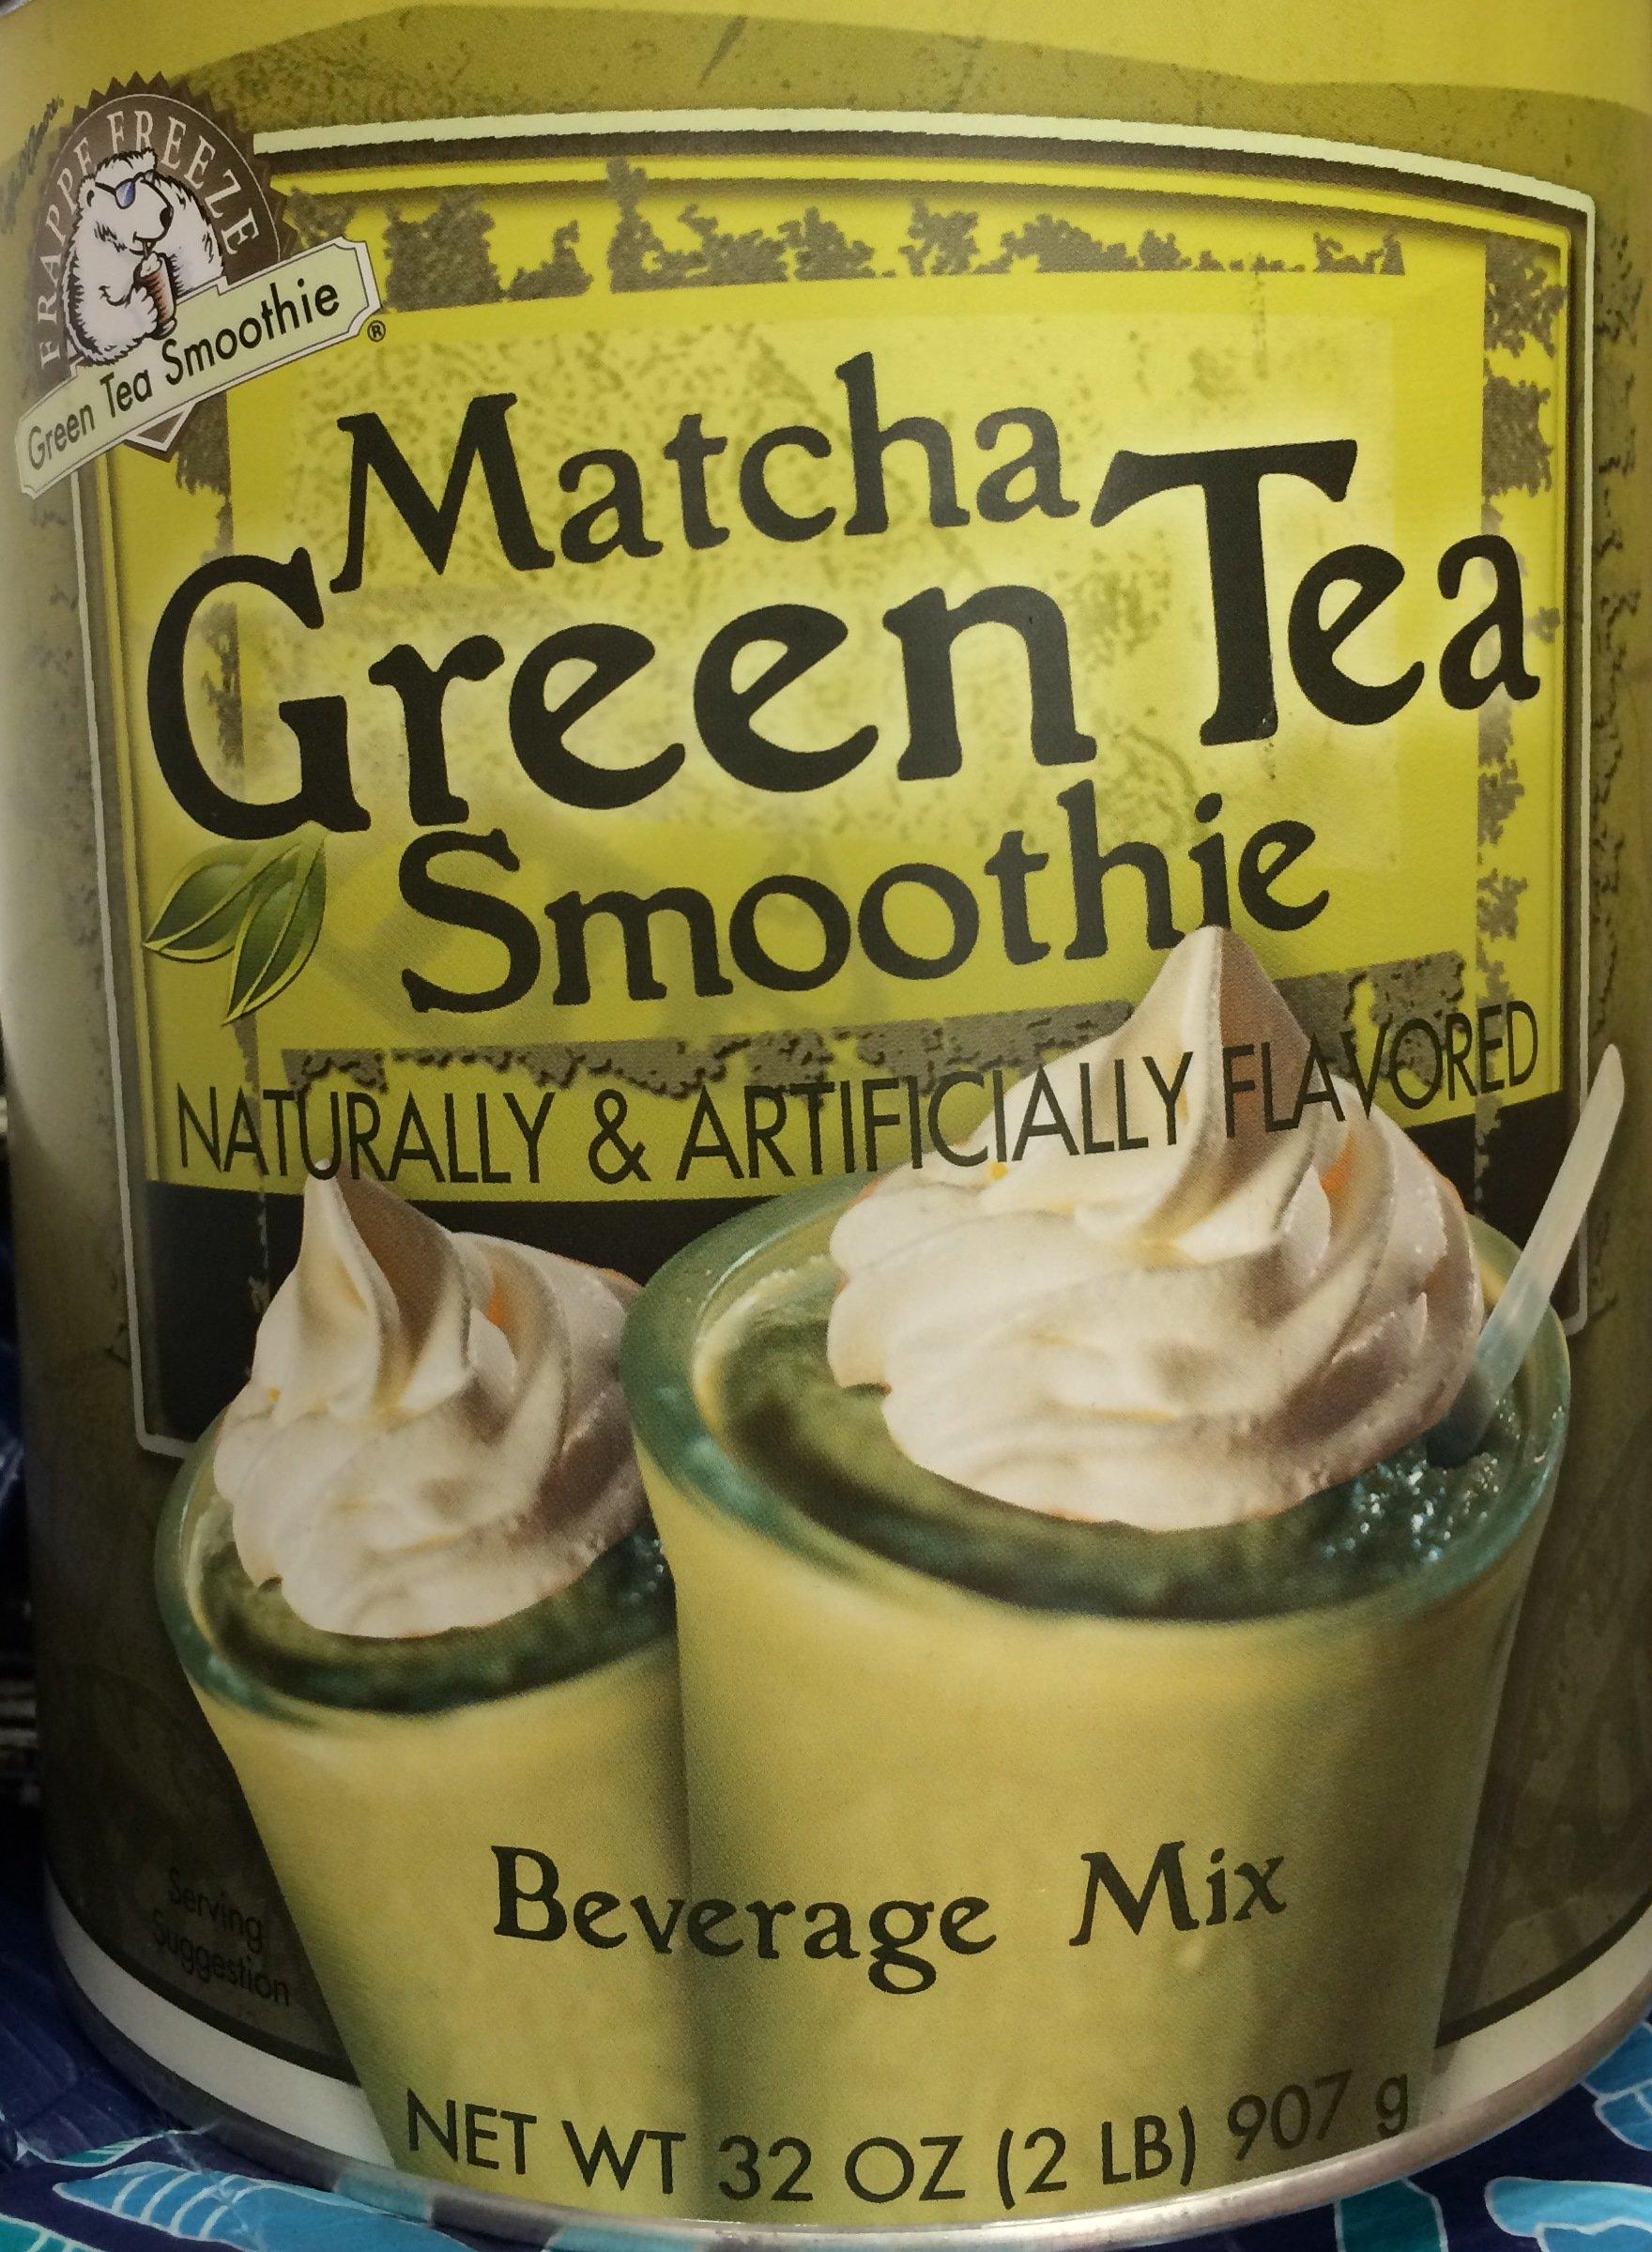 32oz Caffe D'Amore Matcha Green Tea Smoothie Mix Beverage